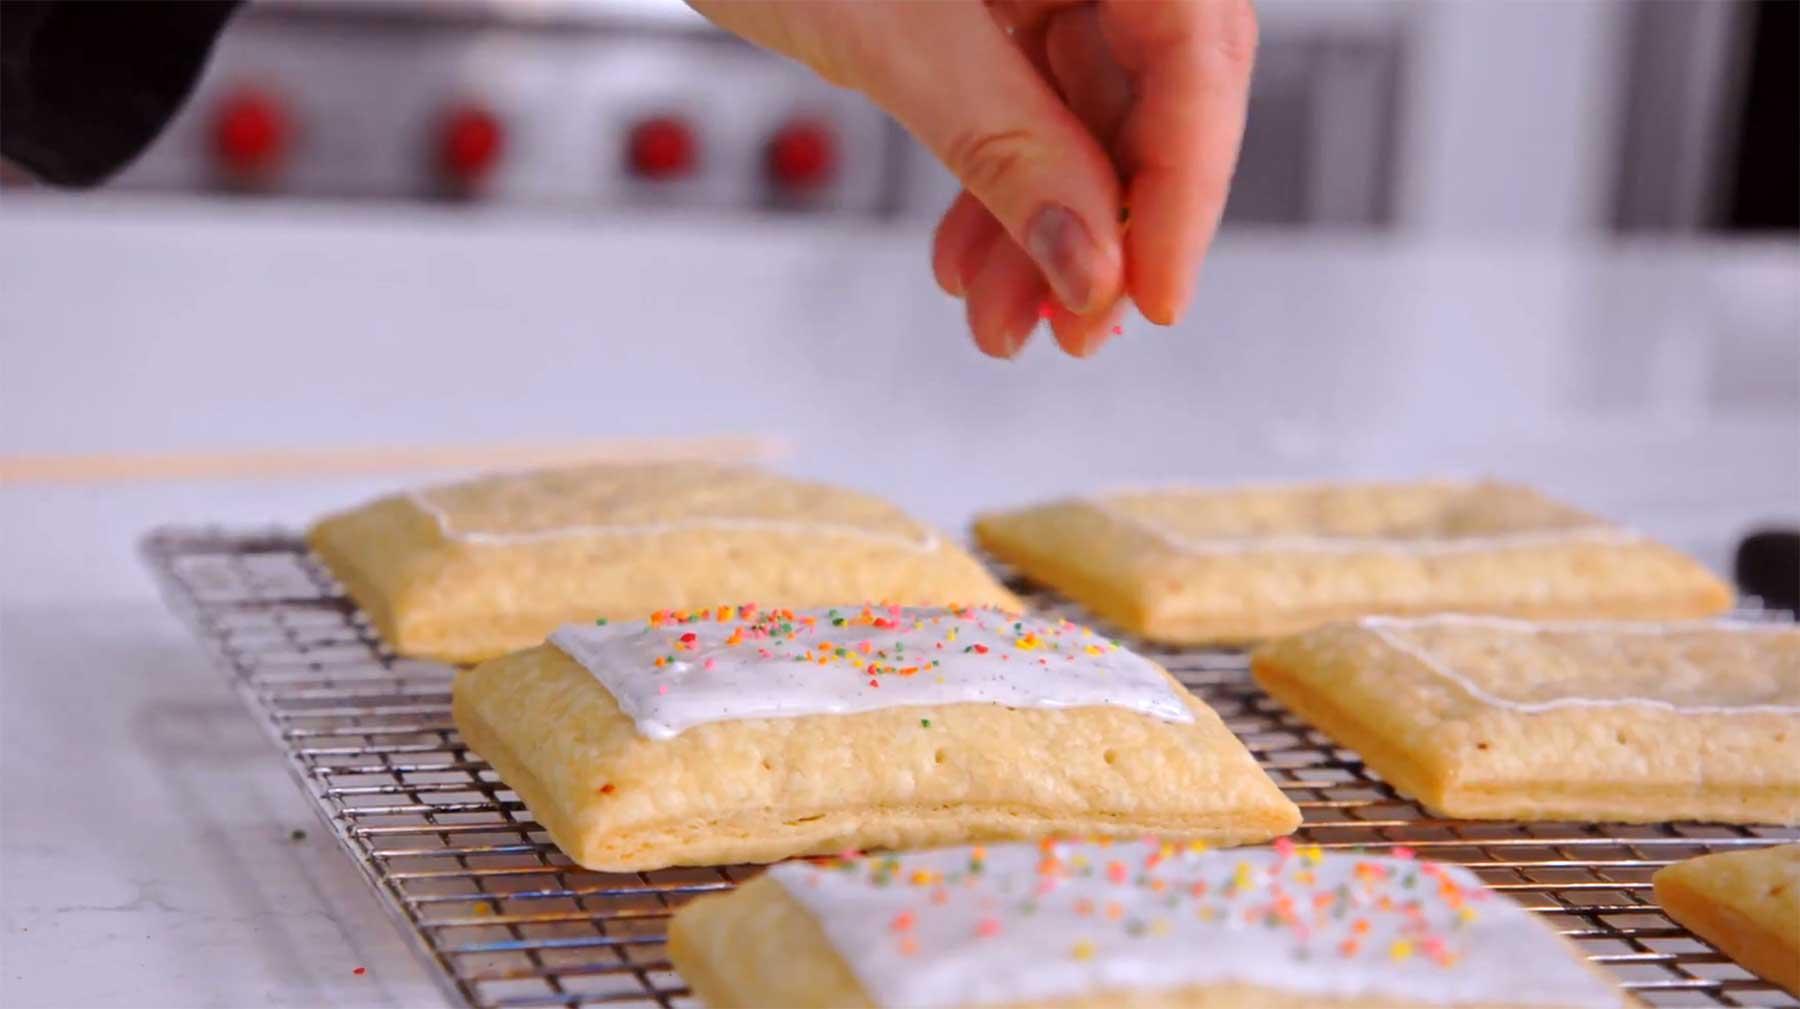 Gourmet-Köchin versucht, Pop-Tarts nachzumachen gourmet-pop-tarts-selbstgemacht